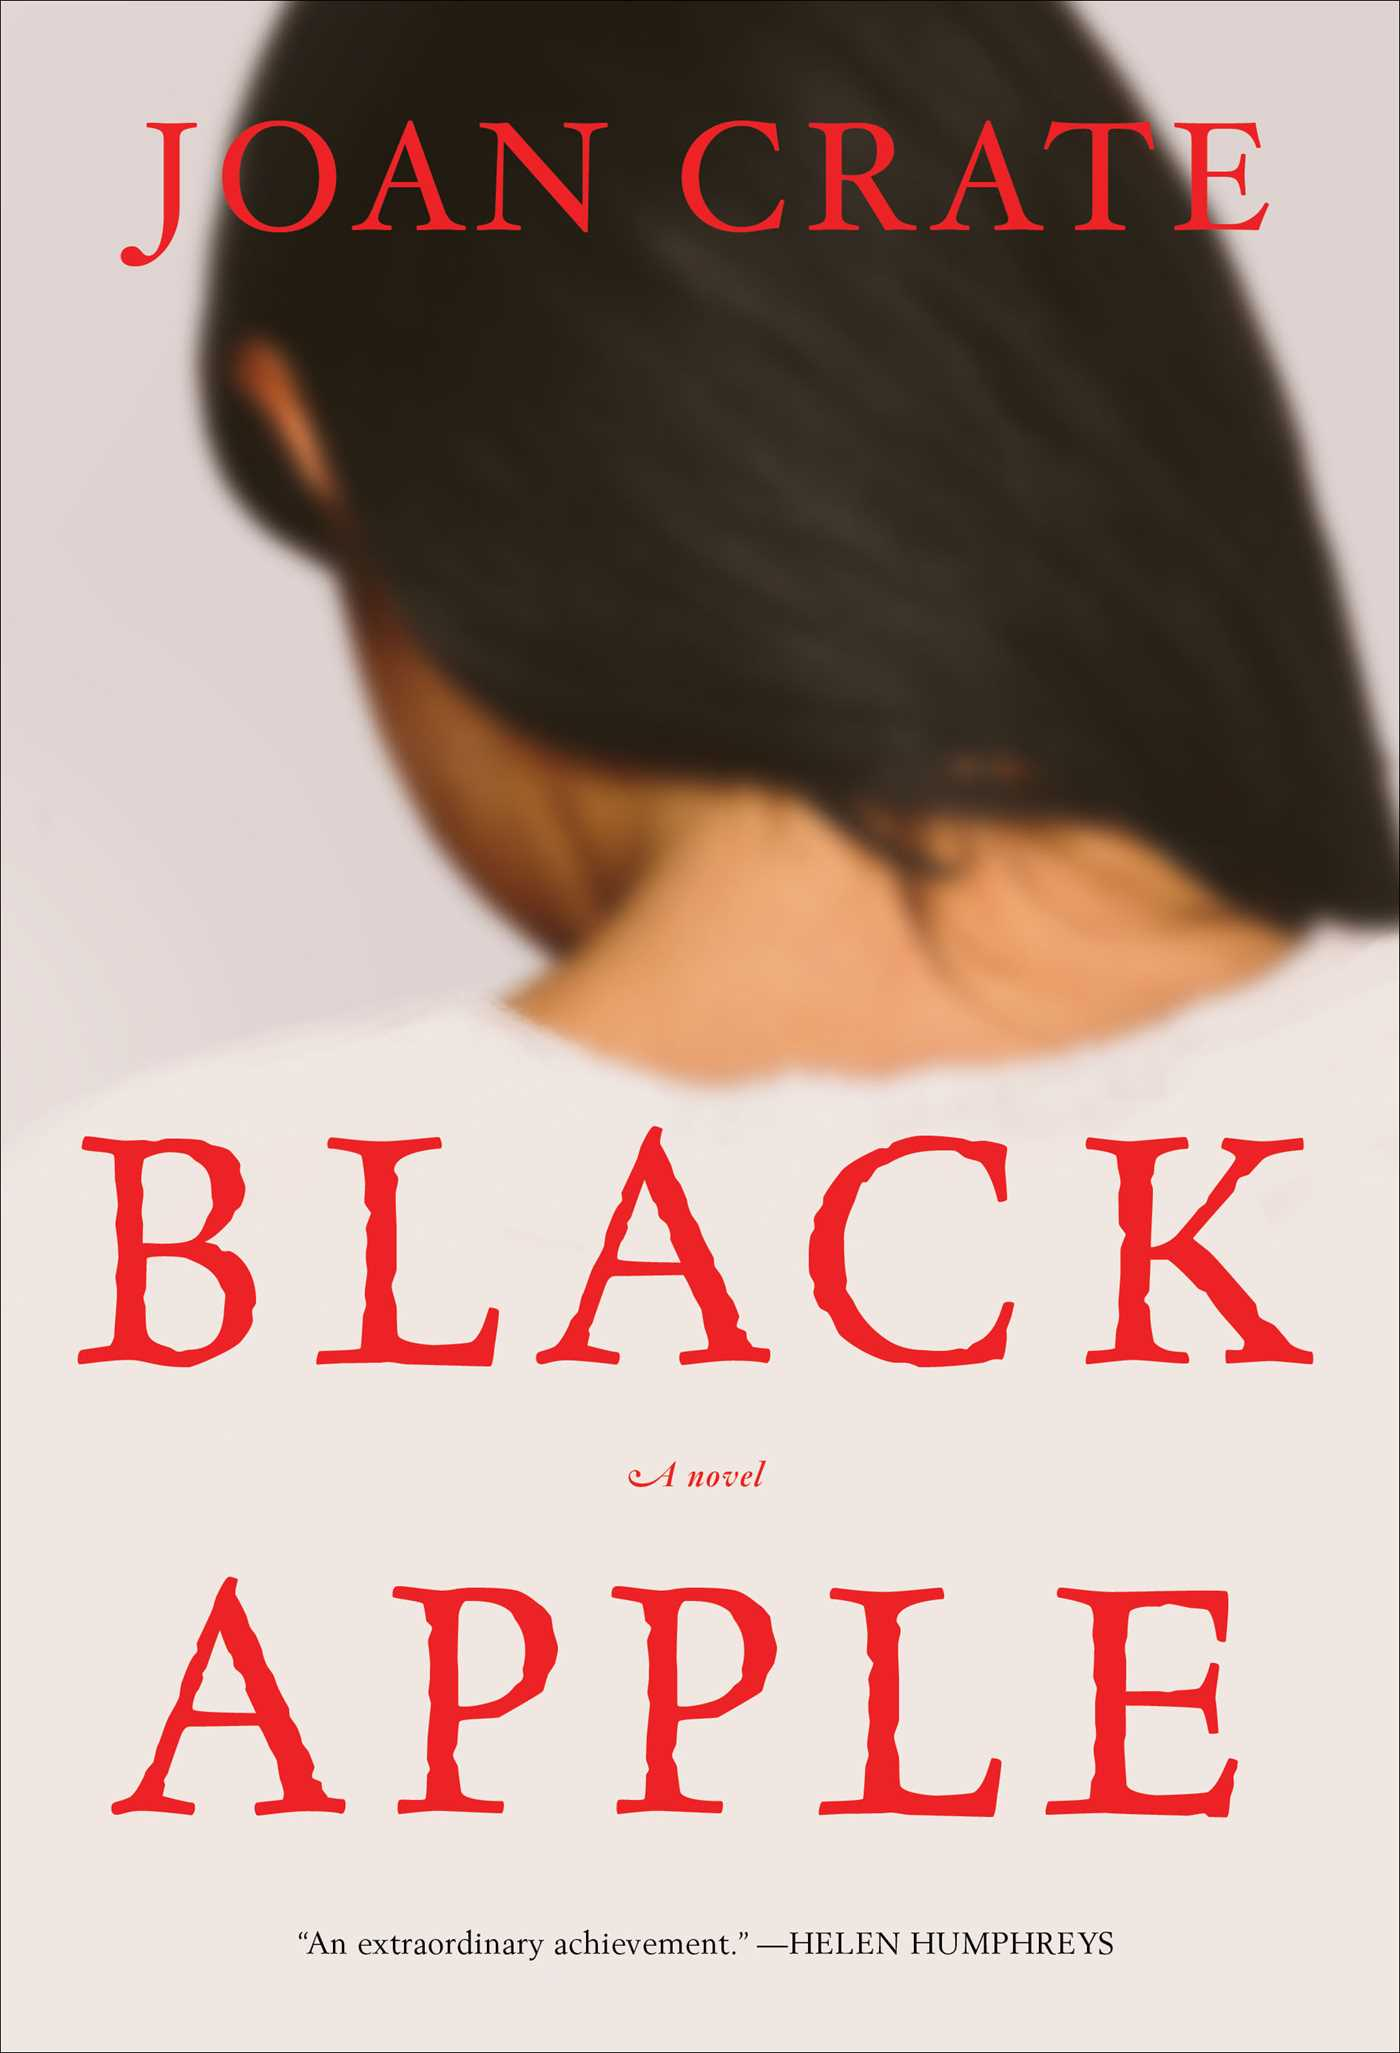 books black apple joan crate